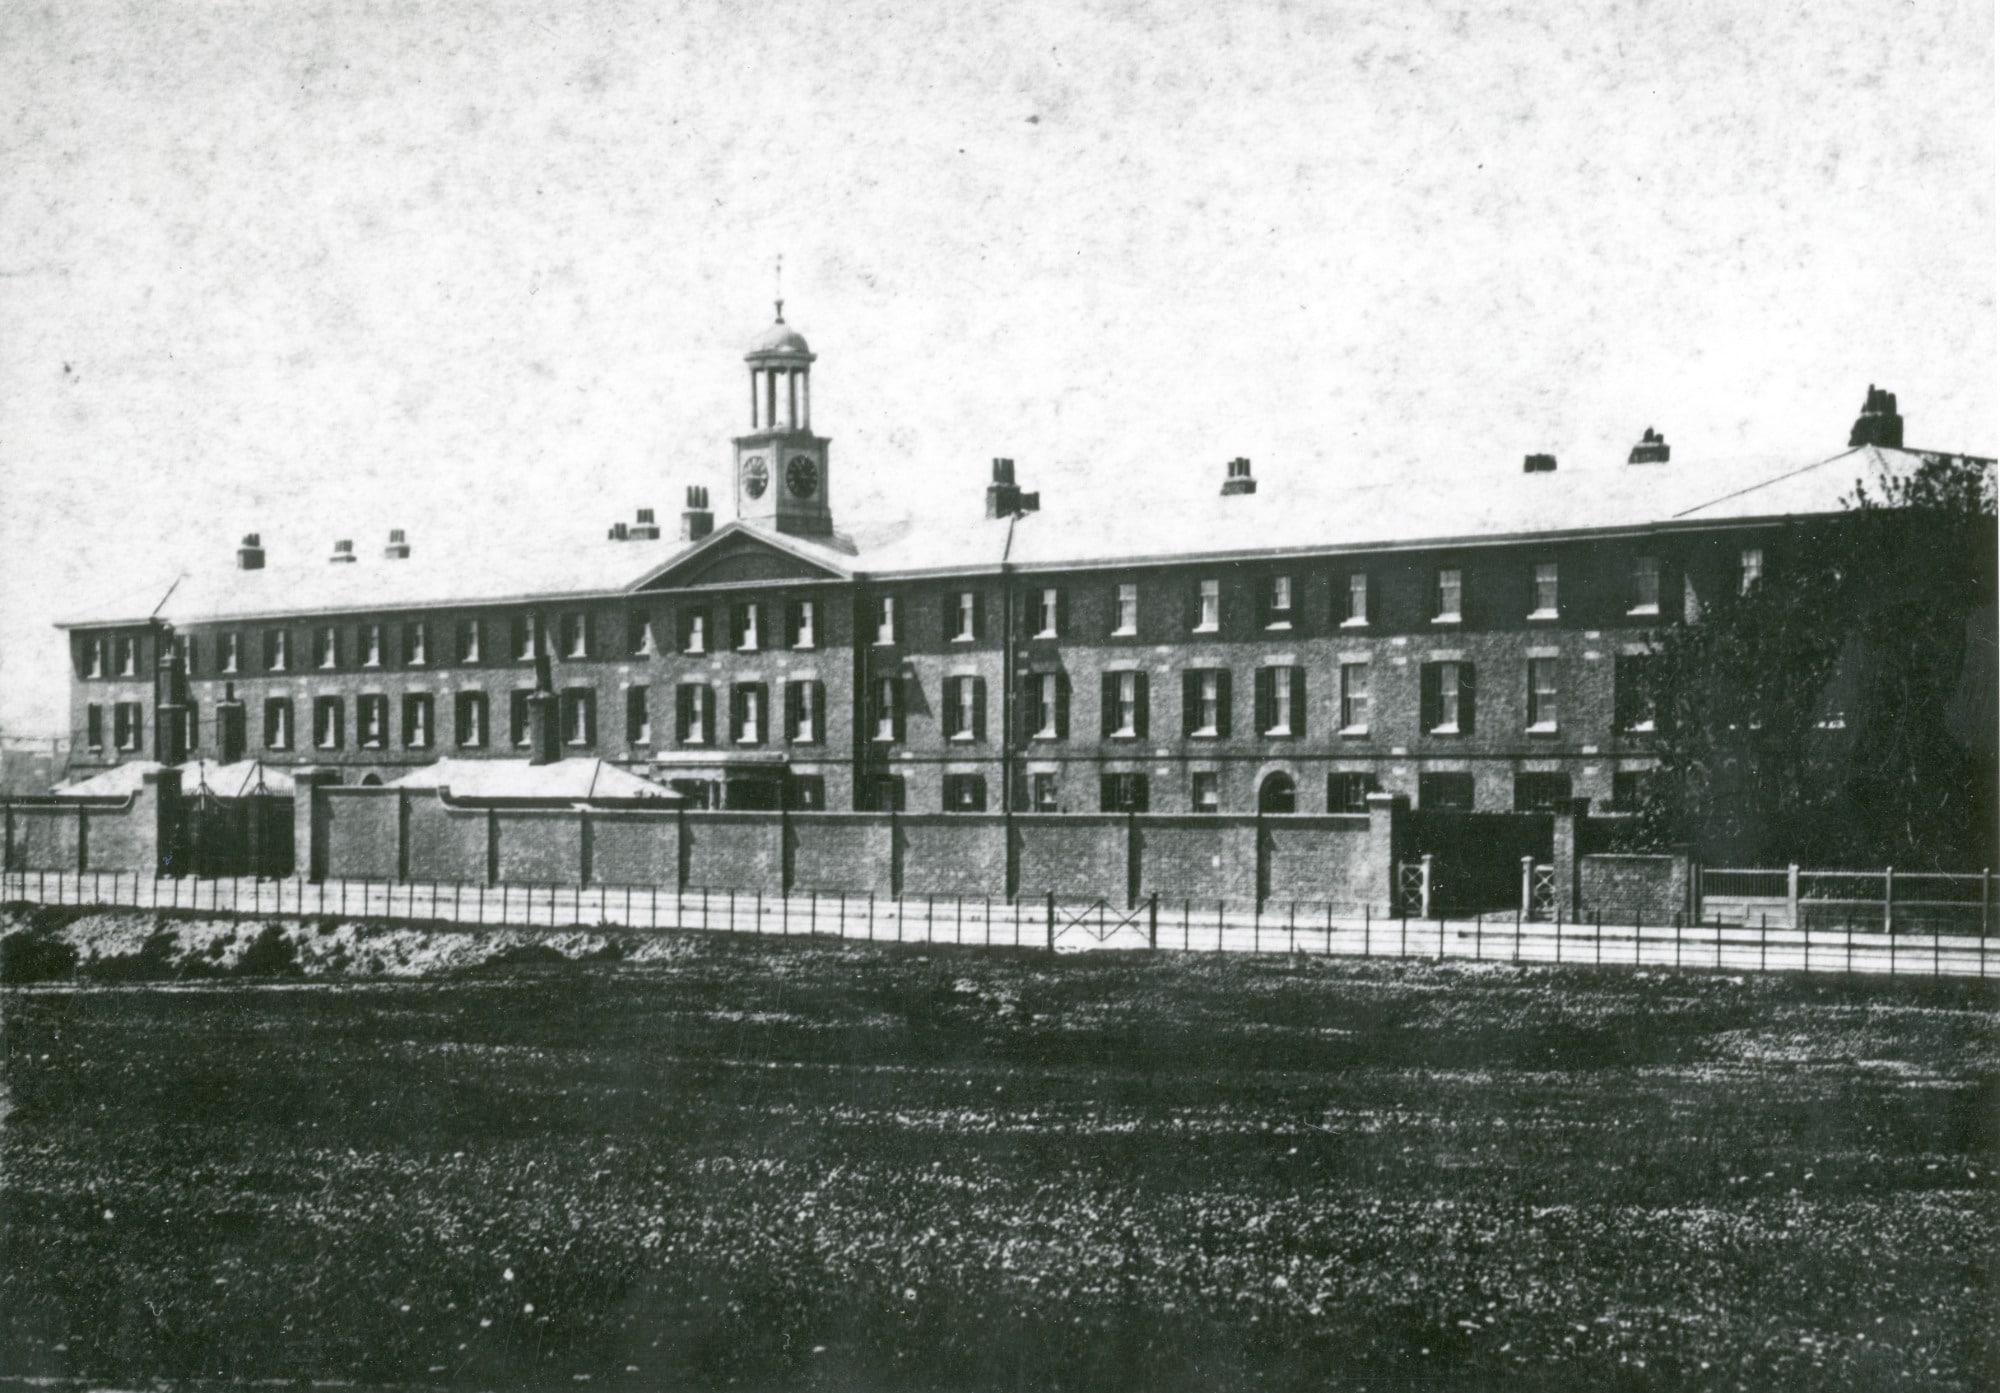 East Barracks